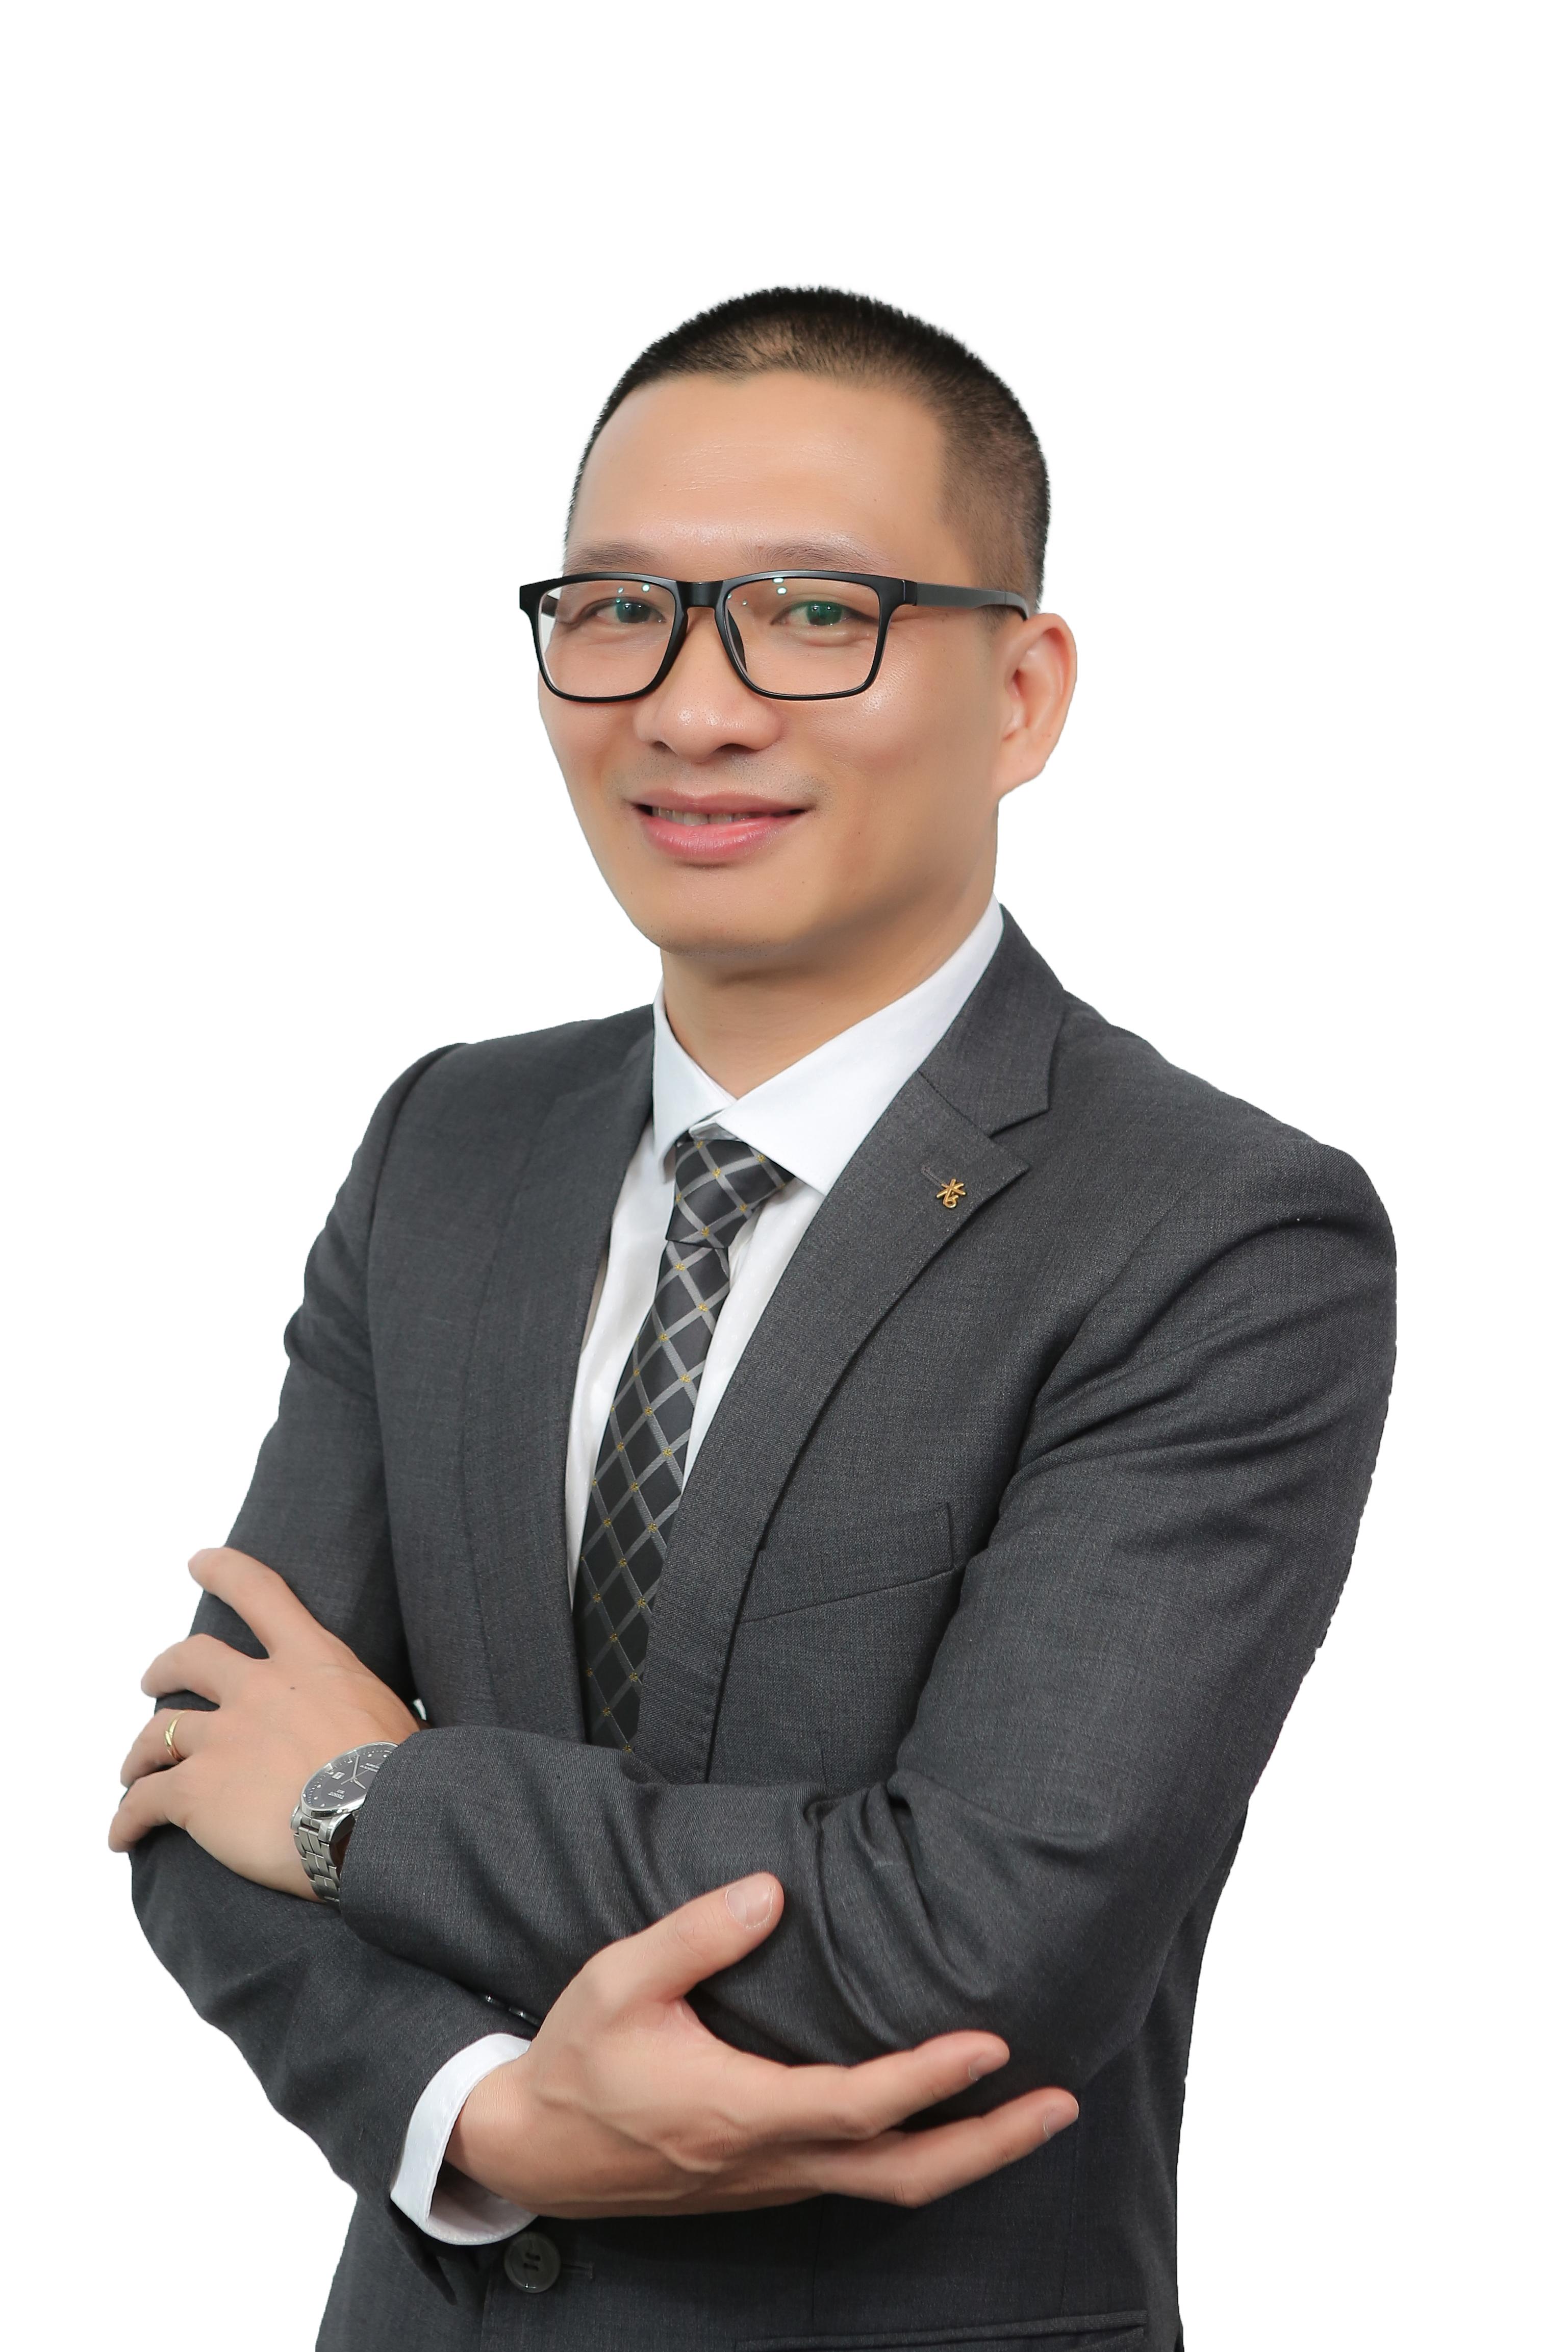 Mr. Nguyen Pham Quynh